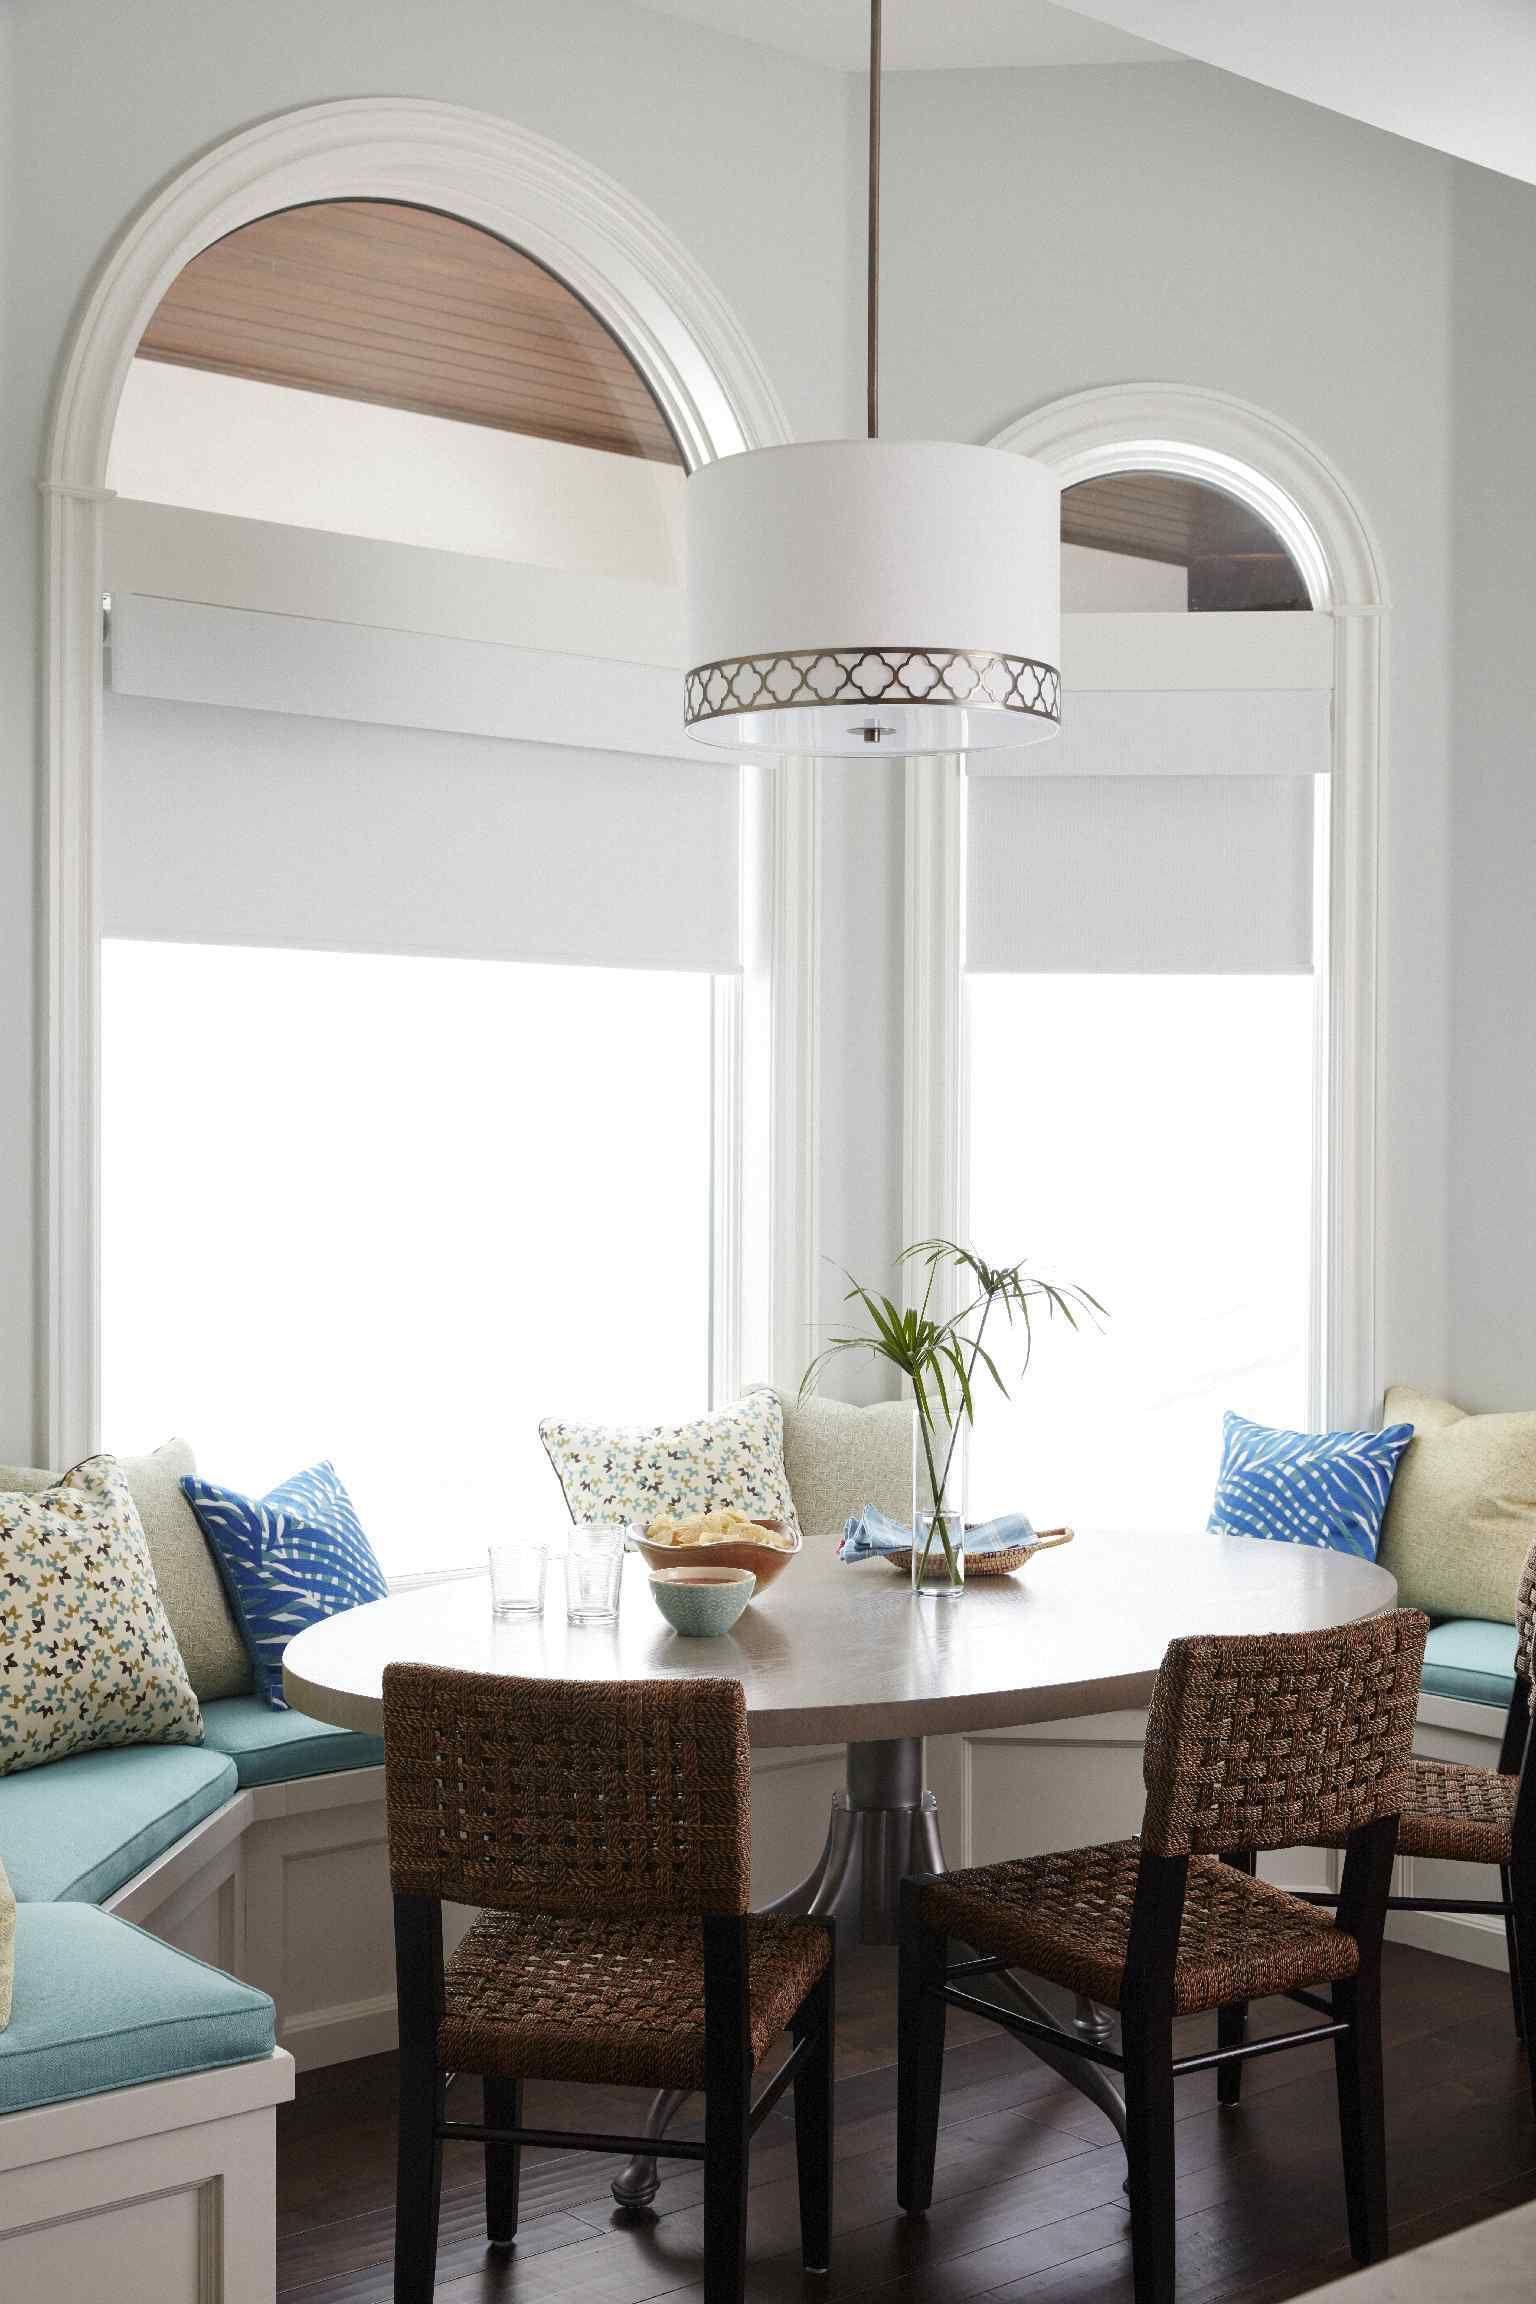 Fixer upper decor ideas also the ultimate plan pinterest rh